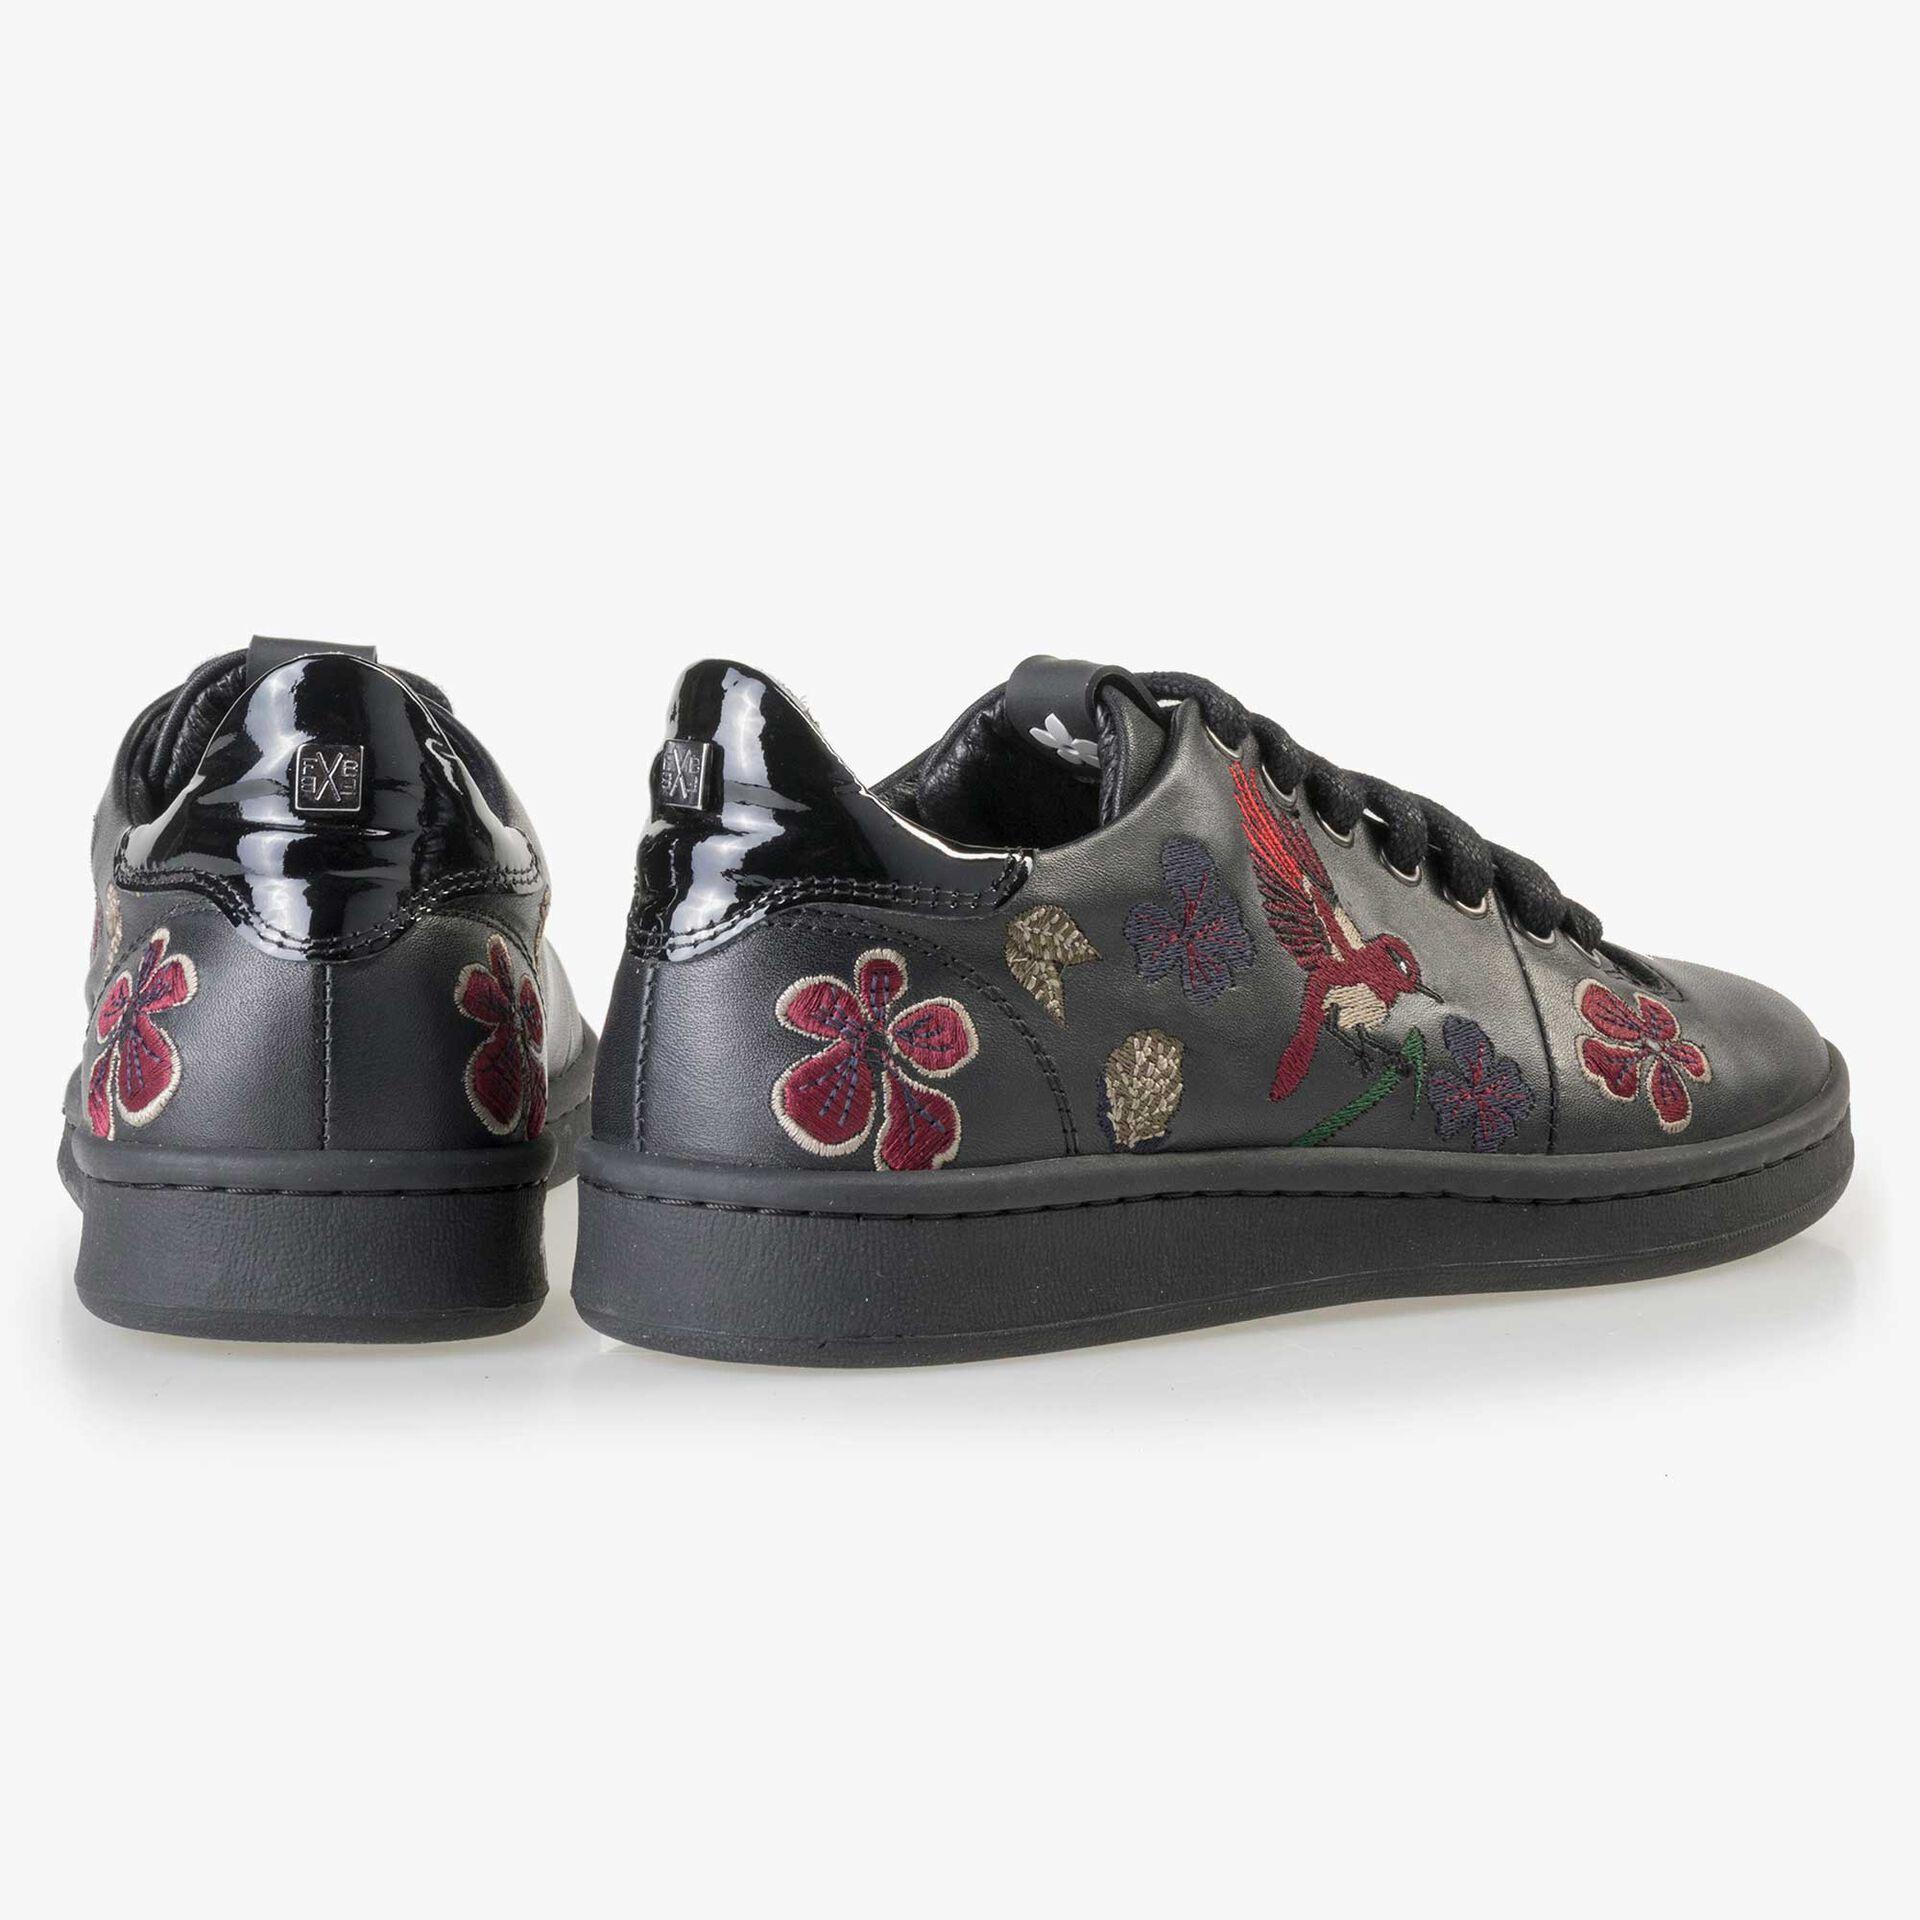 Floris van Bommel women's black leather sneaker